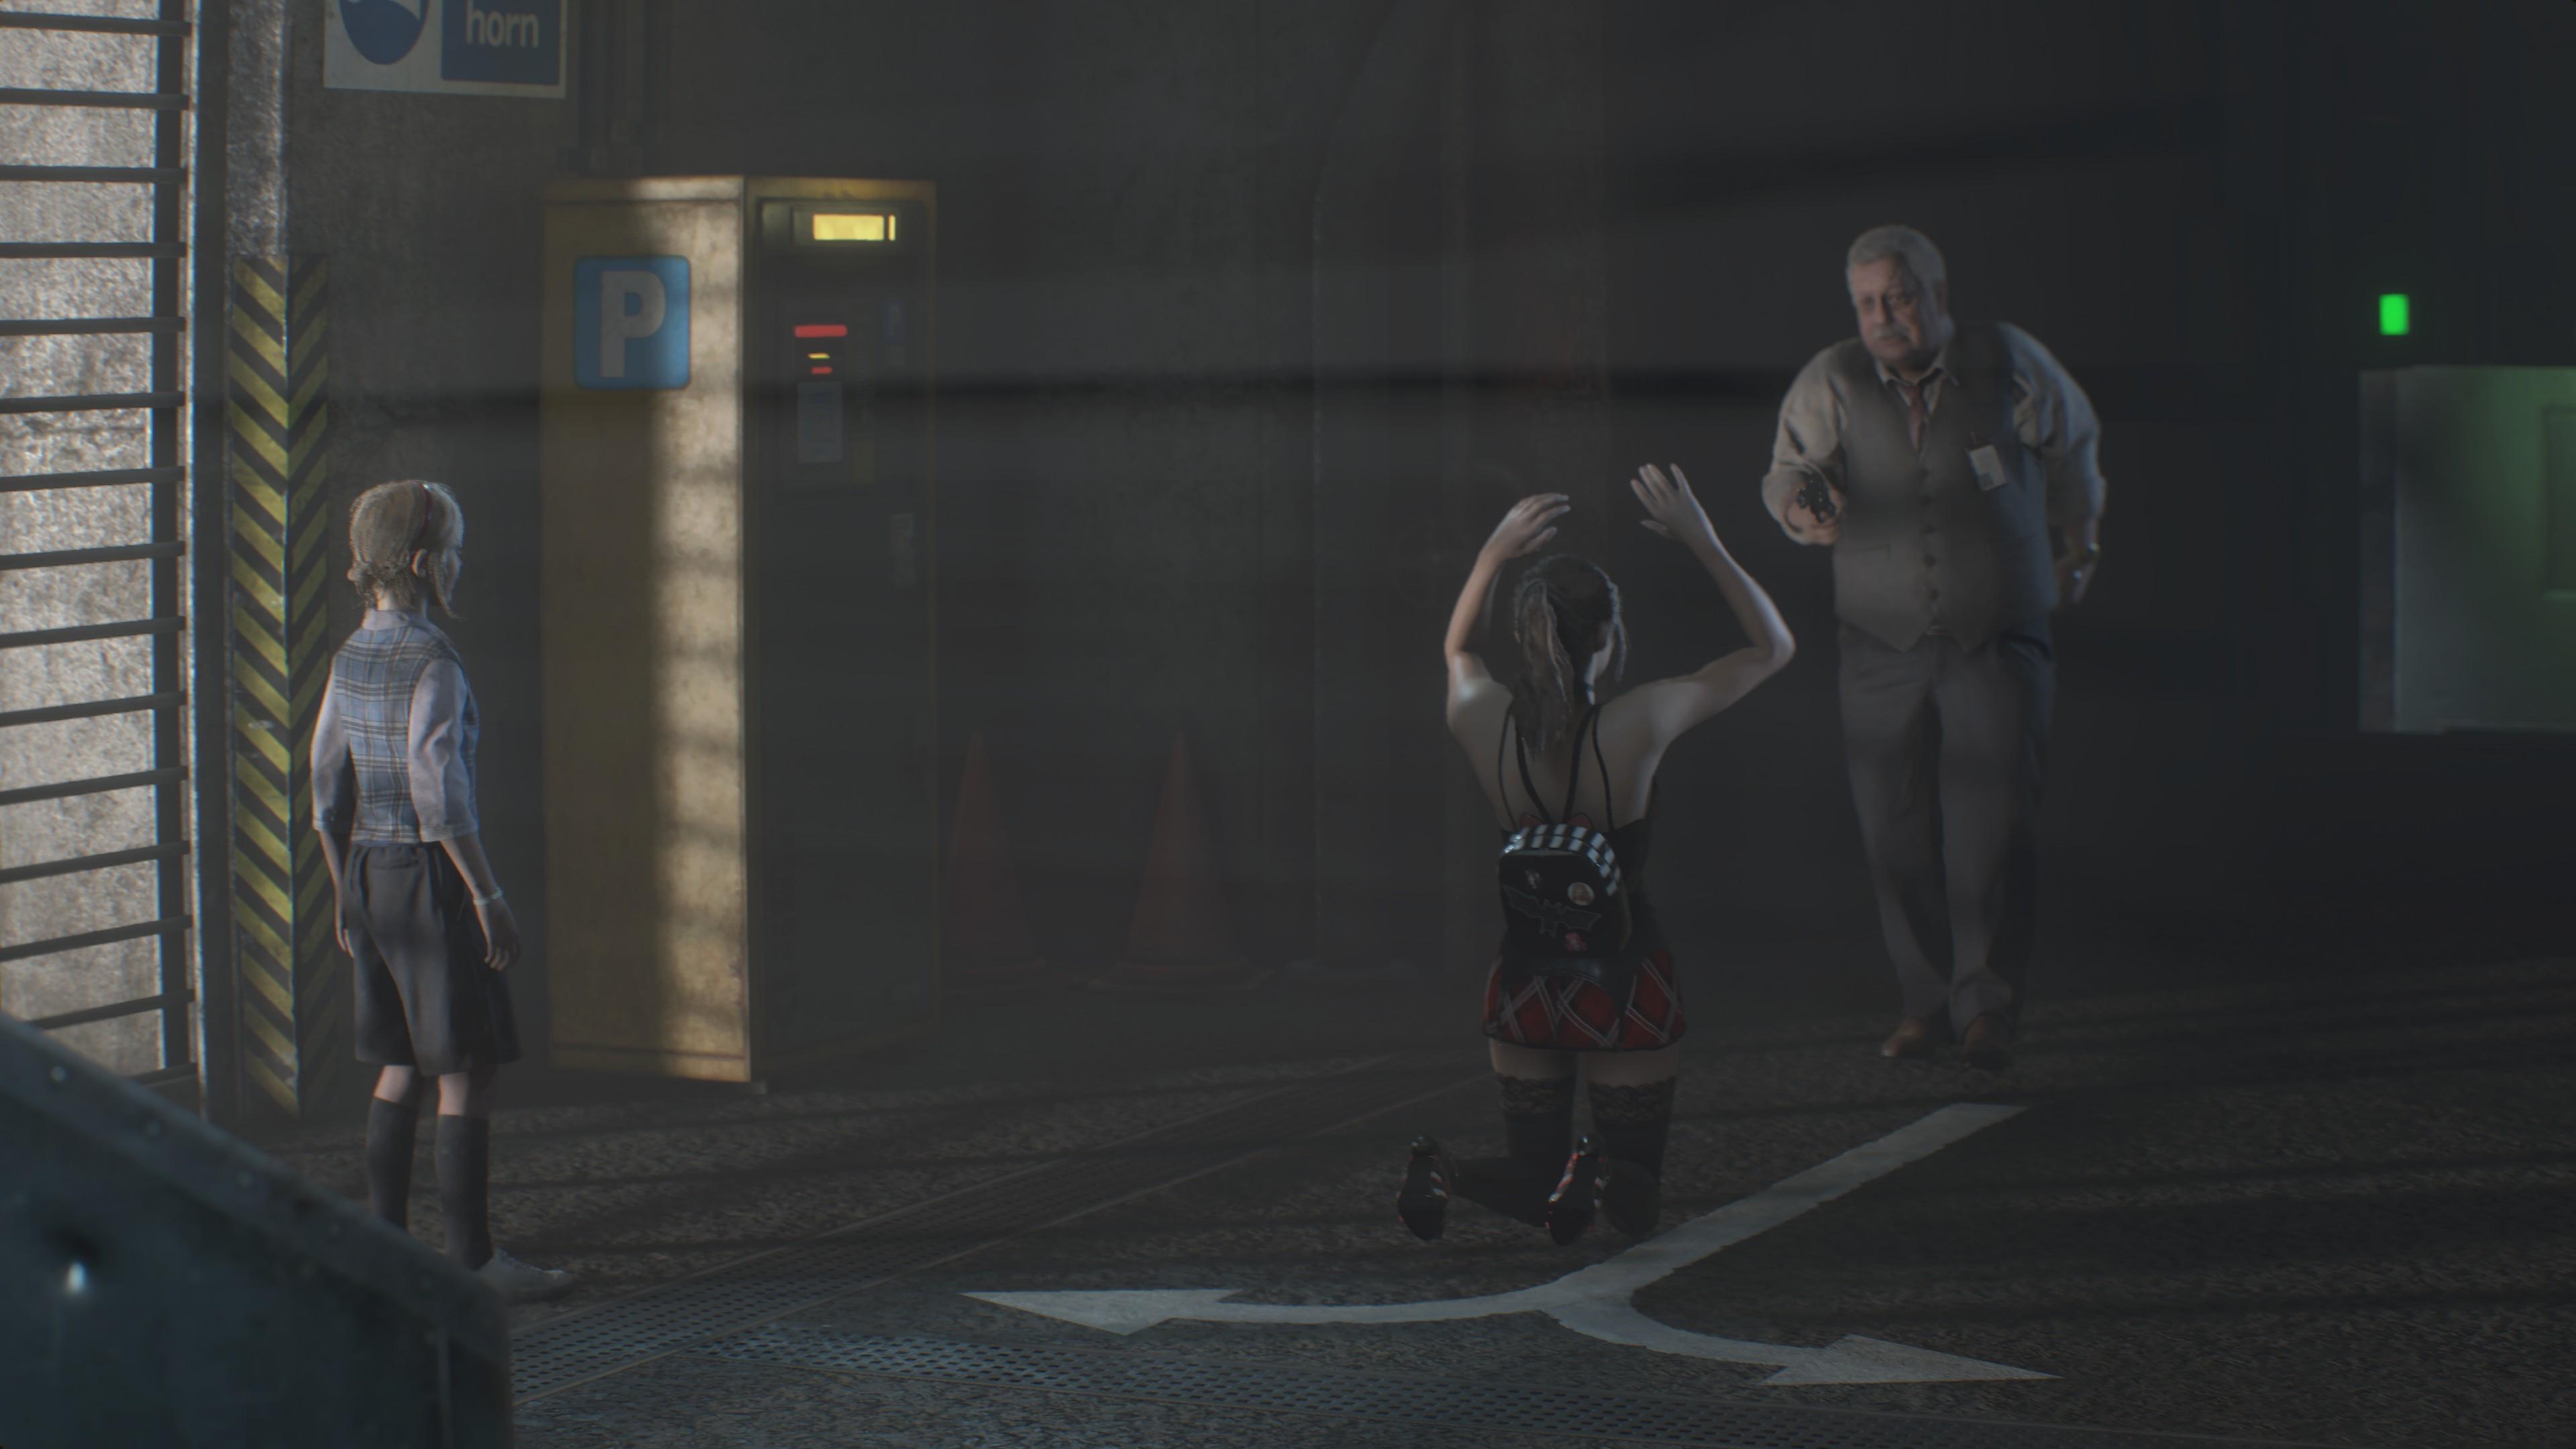 RESIDENT EVIL 2 / BIOHAZARD RE:2 Claire College girl 4k ultra graphics rtx - Resident Evil 2